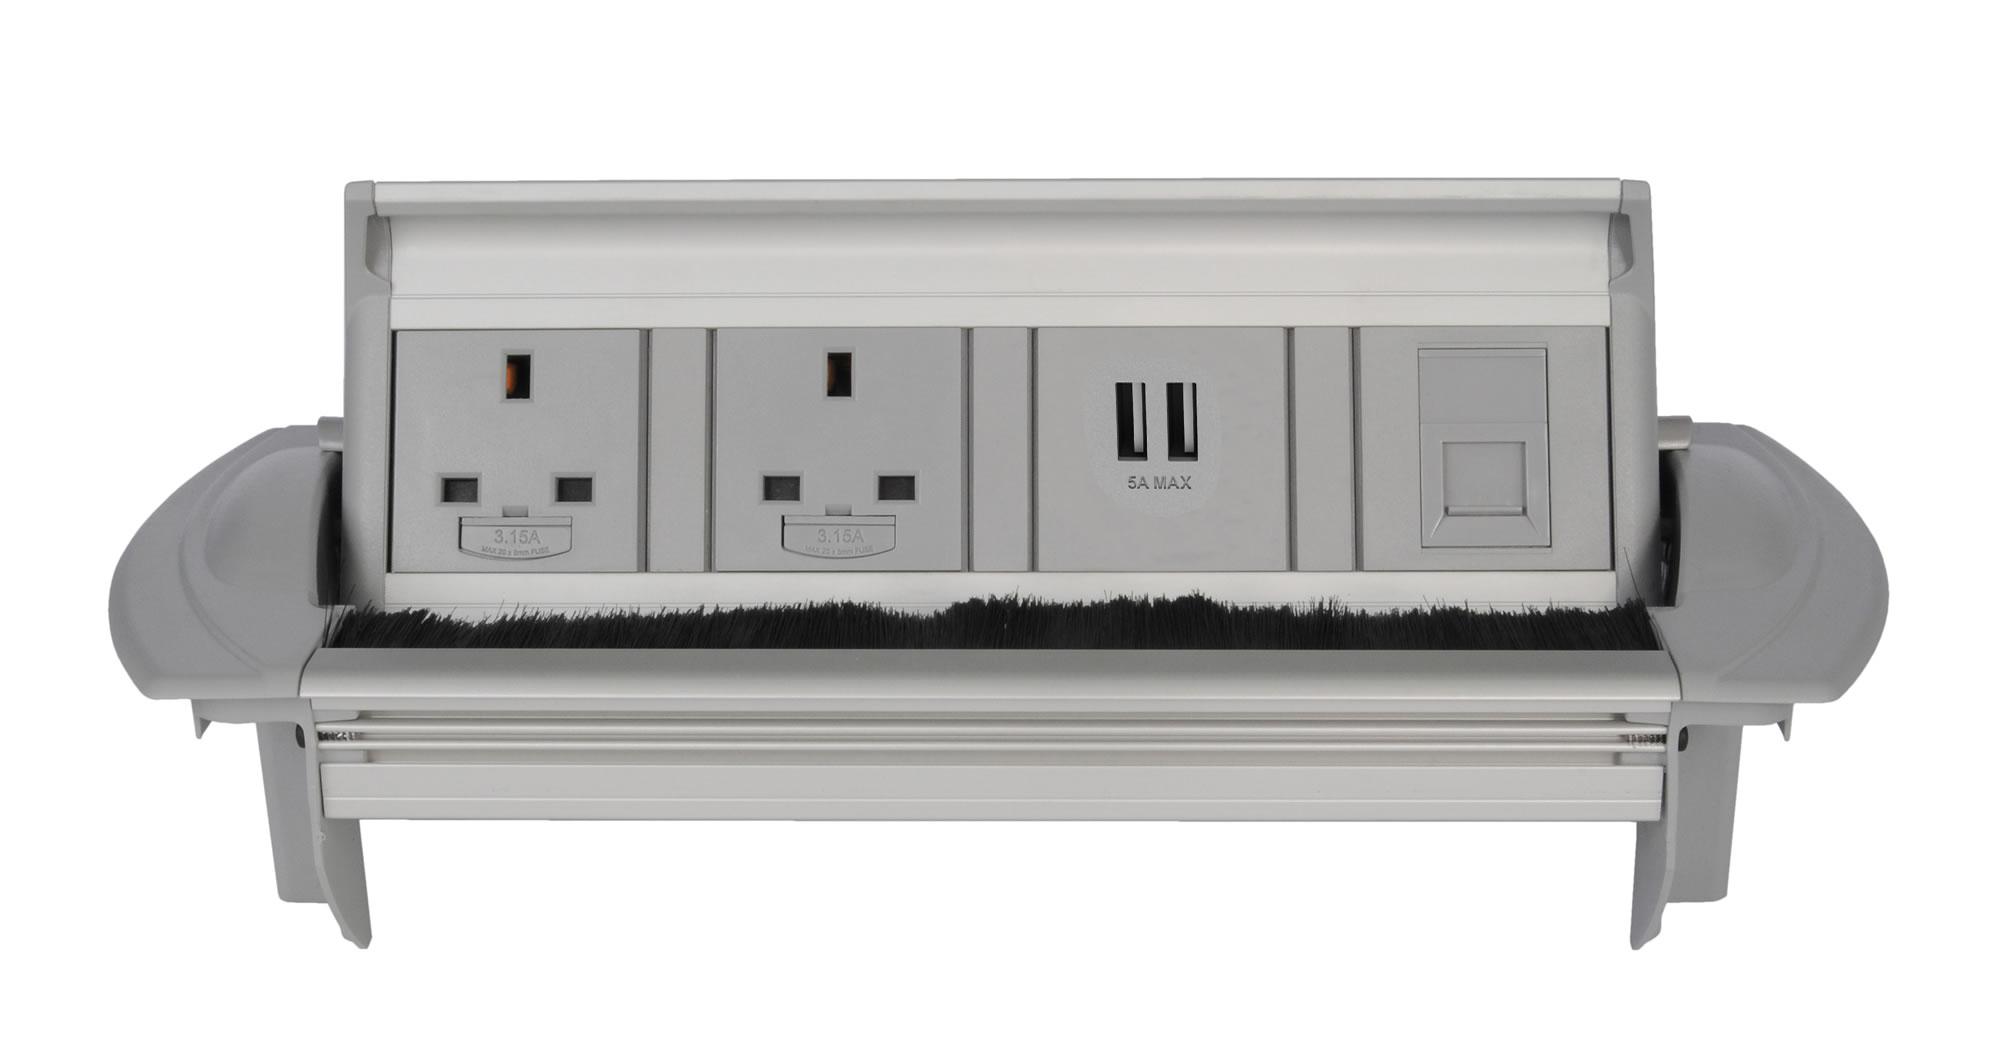 Affinity Power, USB Charging & Data